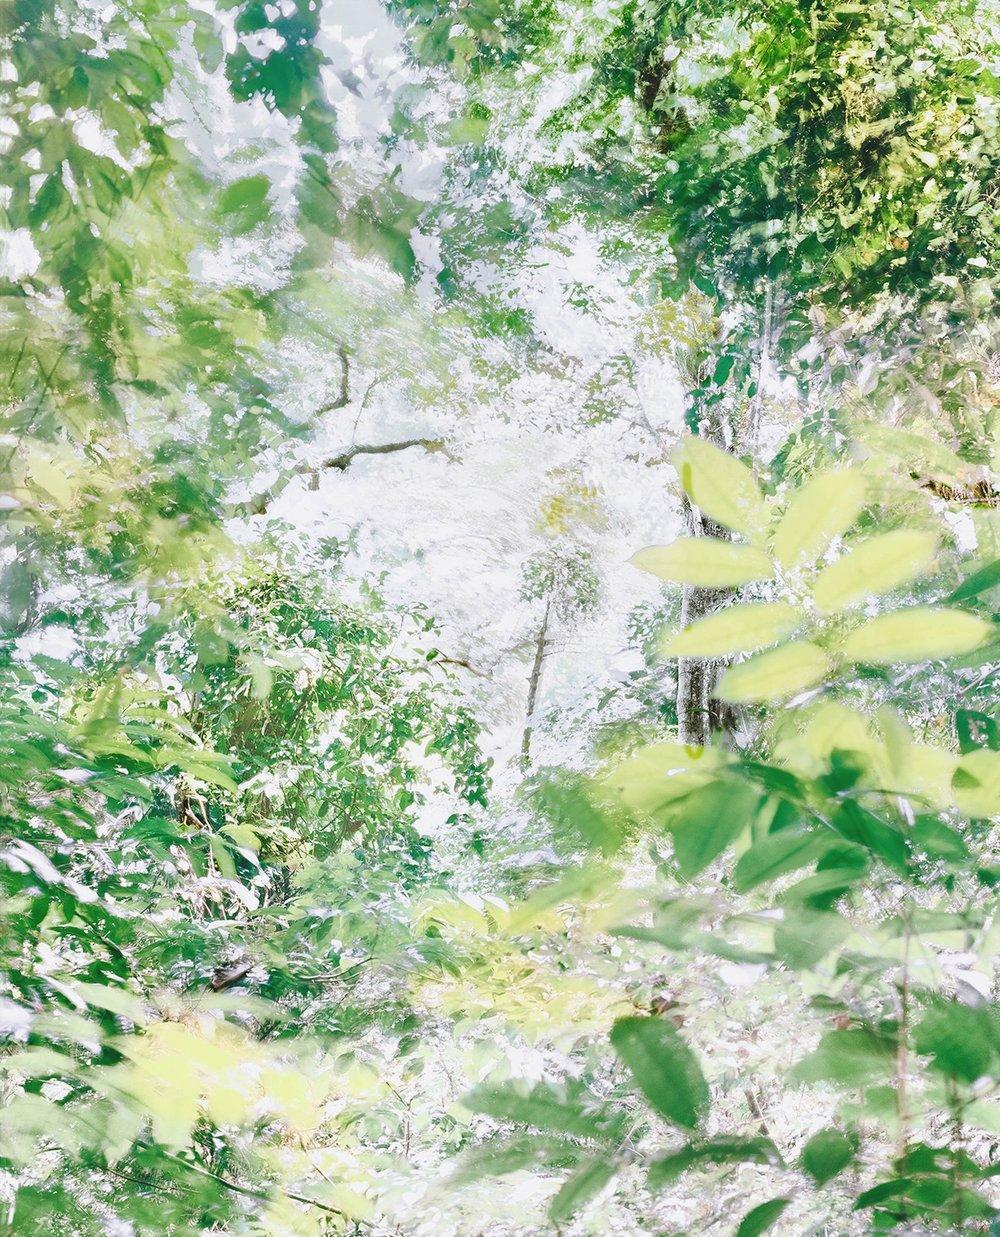 Respiro 17, 2017 37.5 x 30 in Vellum + Archival Inkjet Prints Overlaid